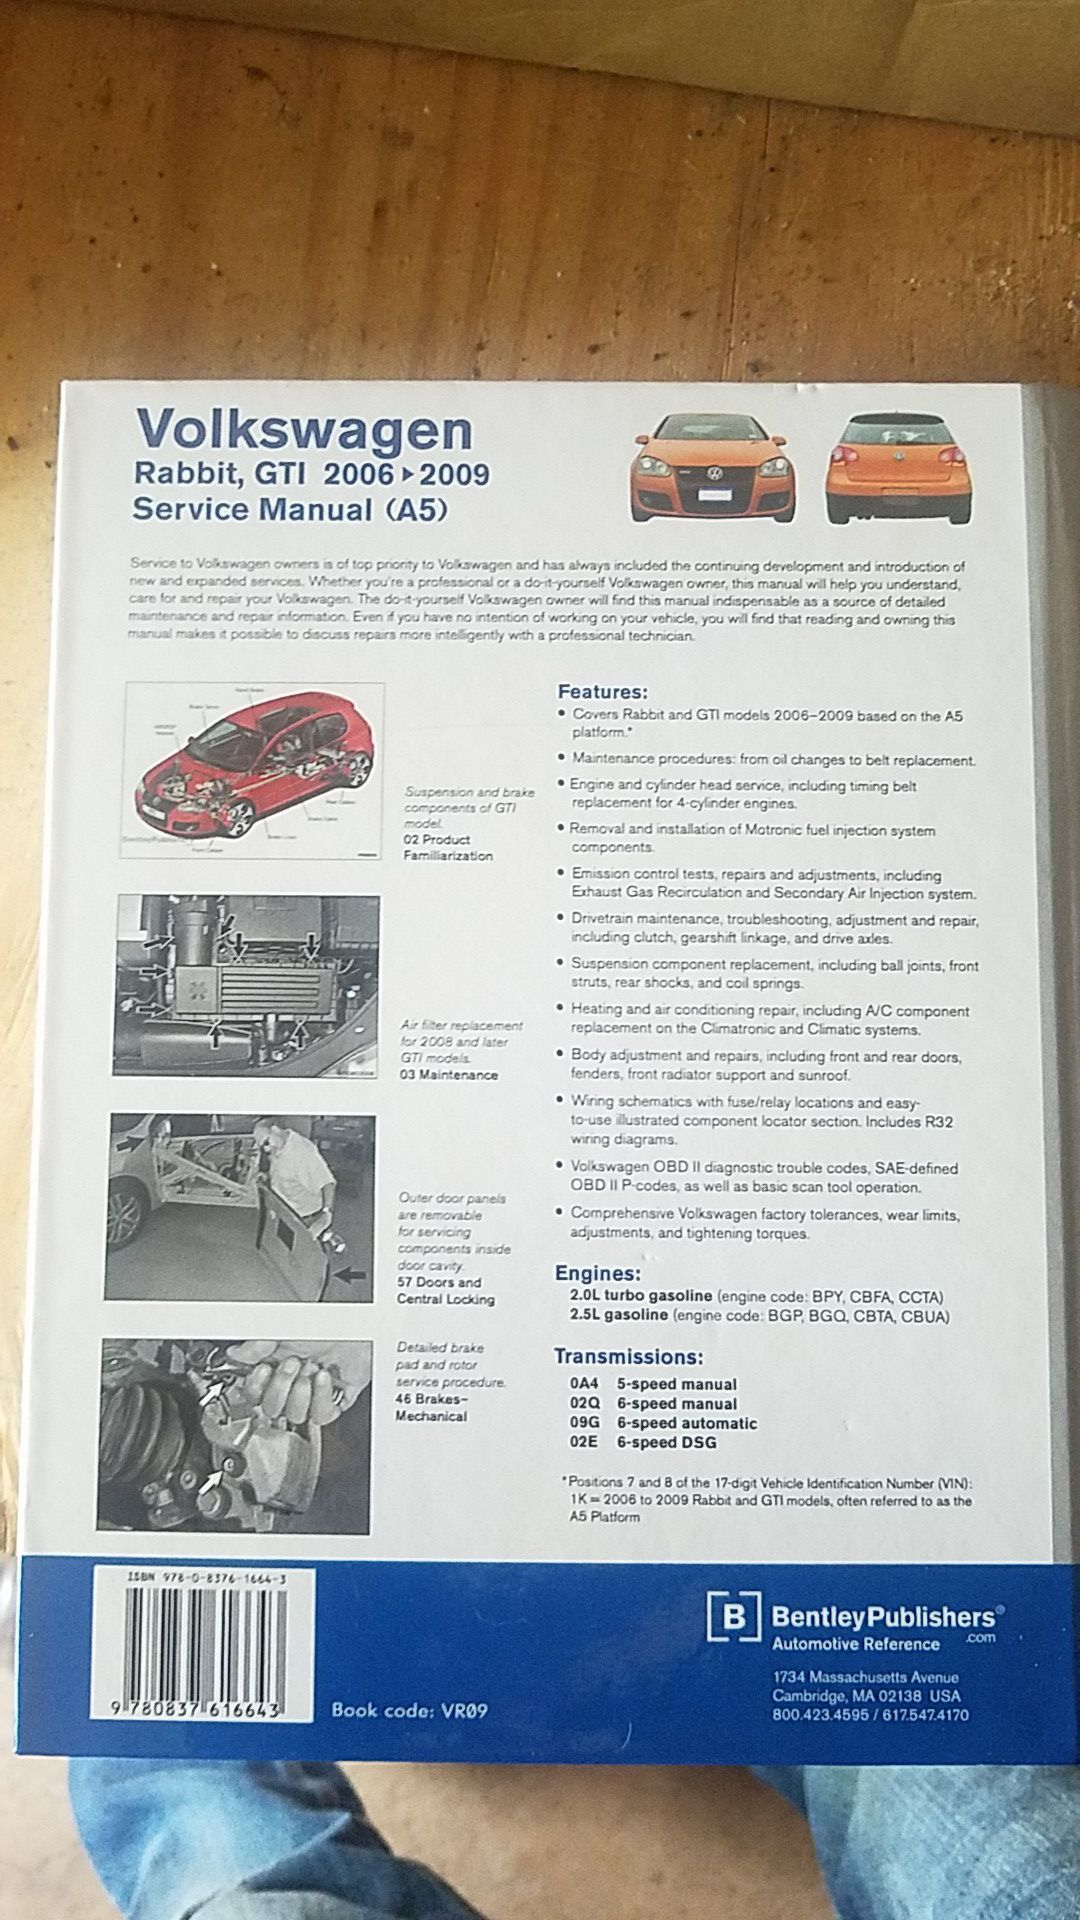 Volkswagen Rabbit, GTI service manual